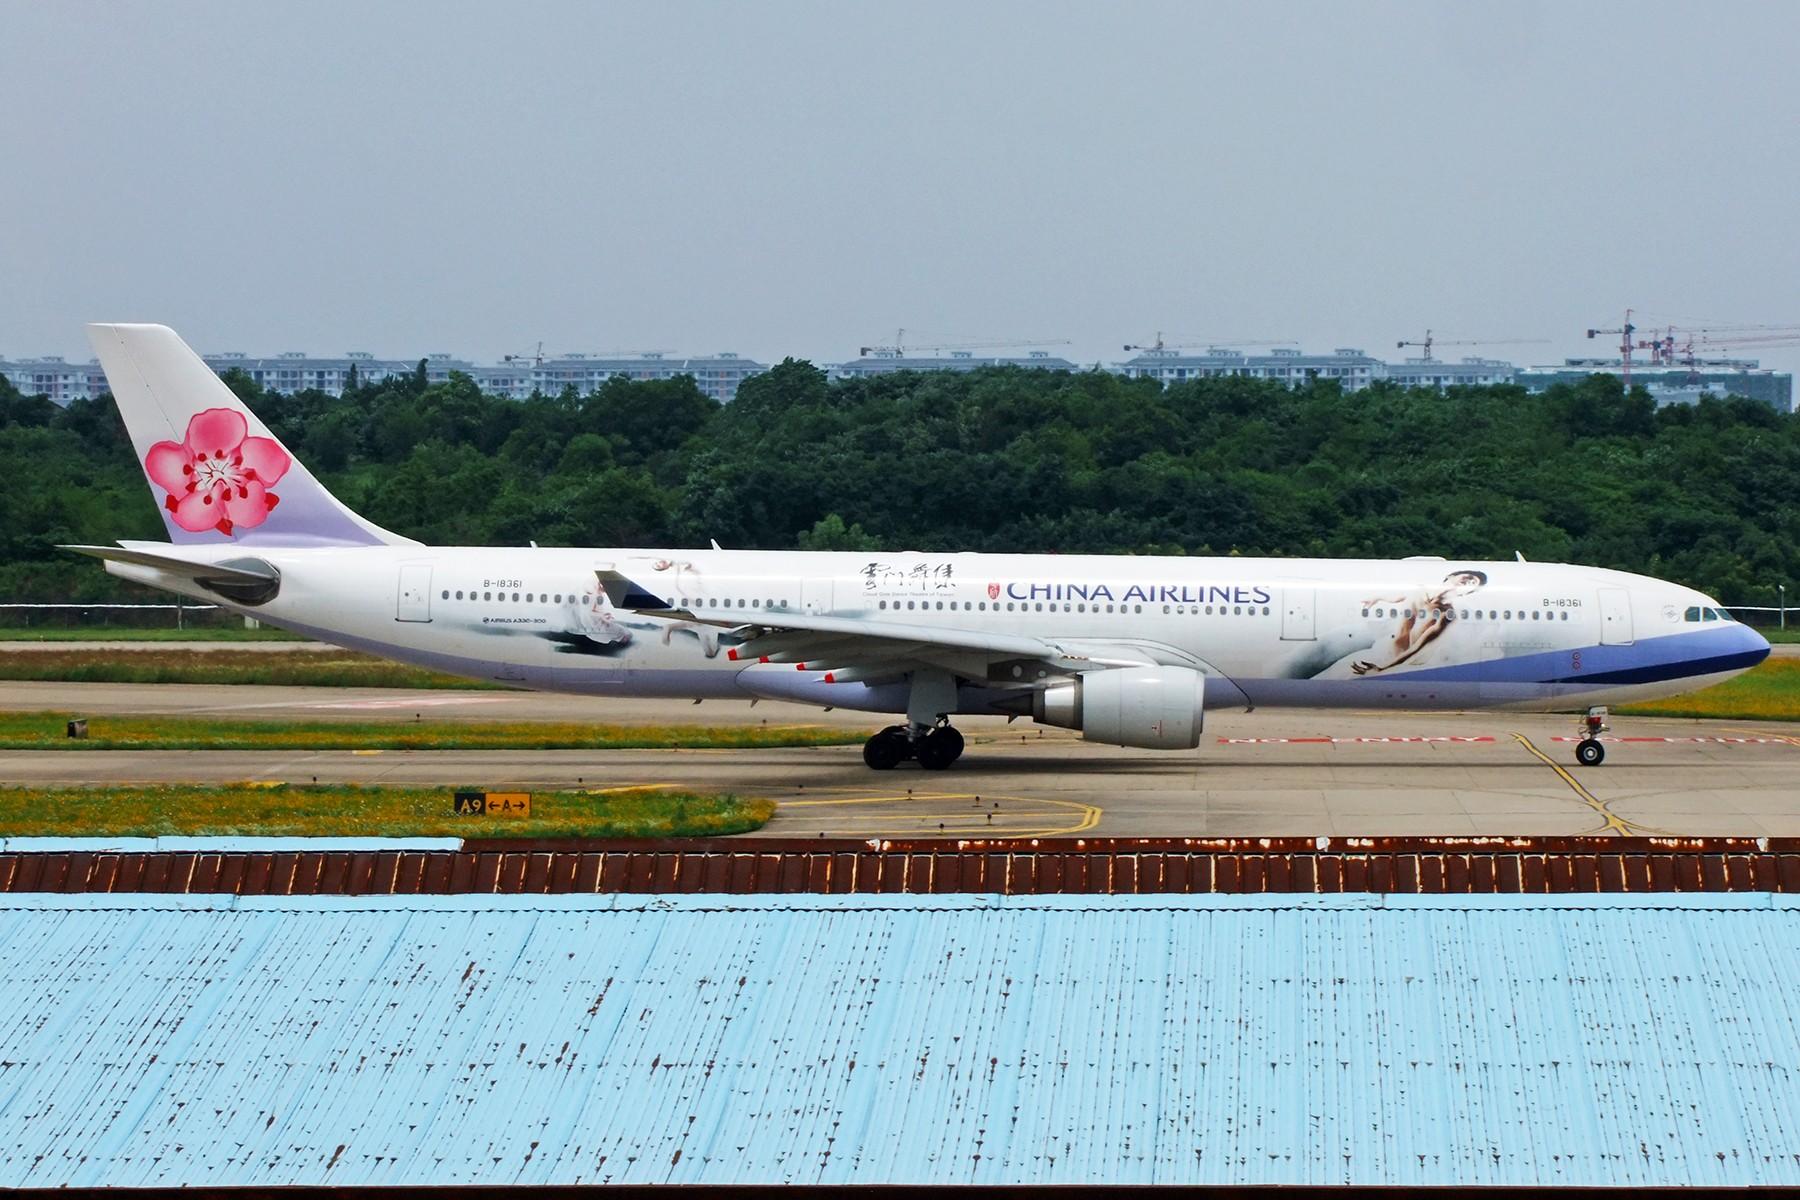 【BLDDQ拖面条】******今天搬回三楼办公室了----小惊喜****** AIRBUS A330-300 B-18361 中国南京禄口国际机场